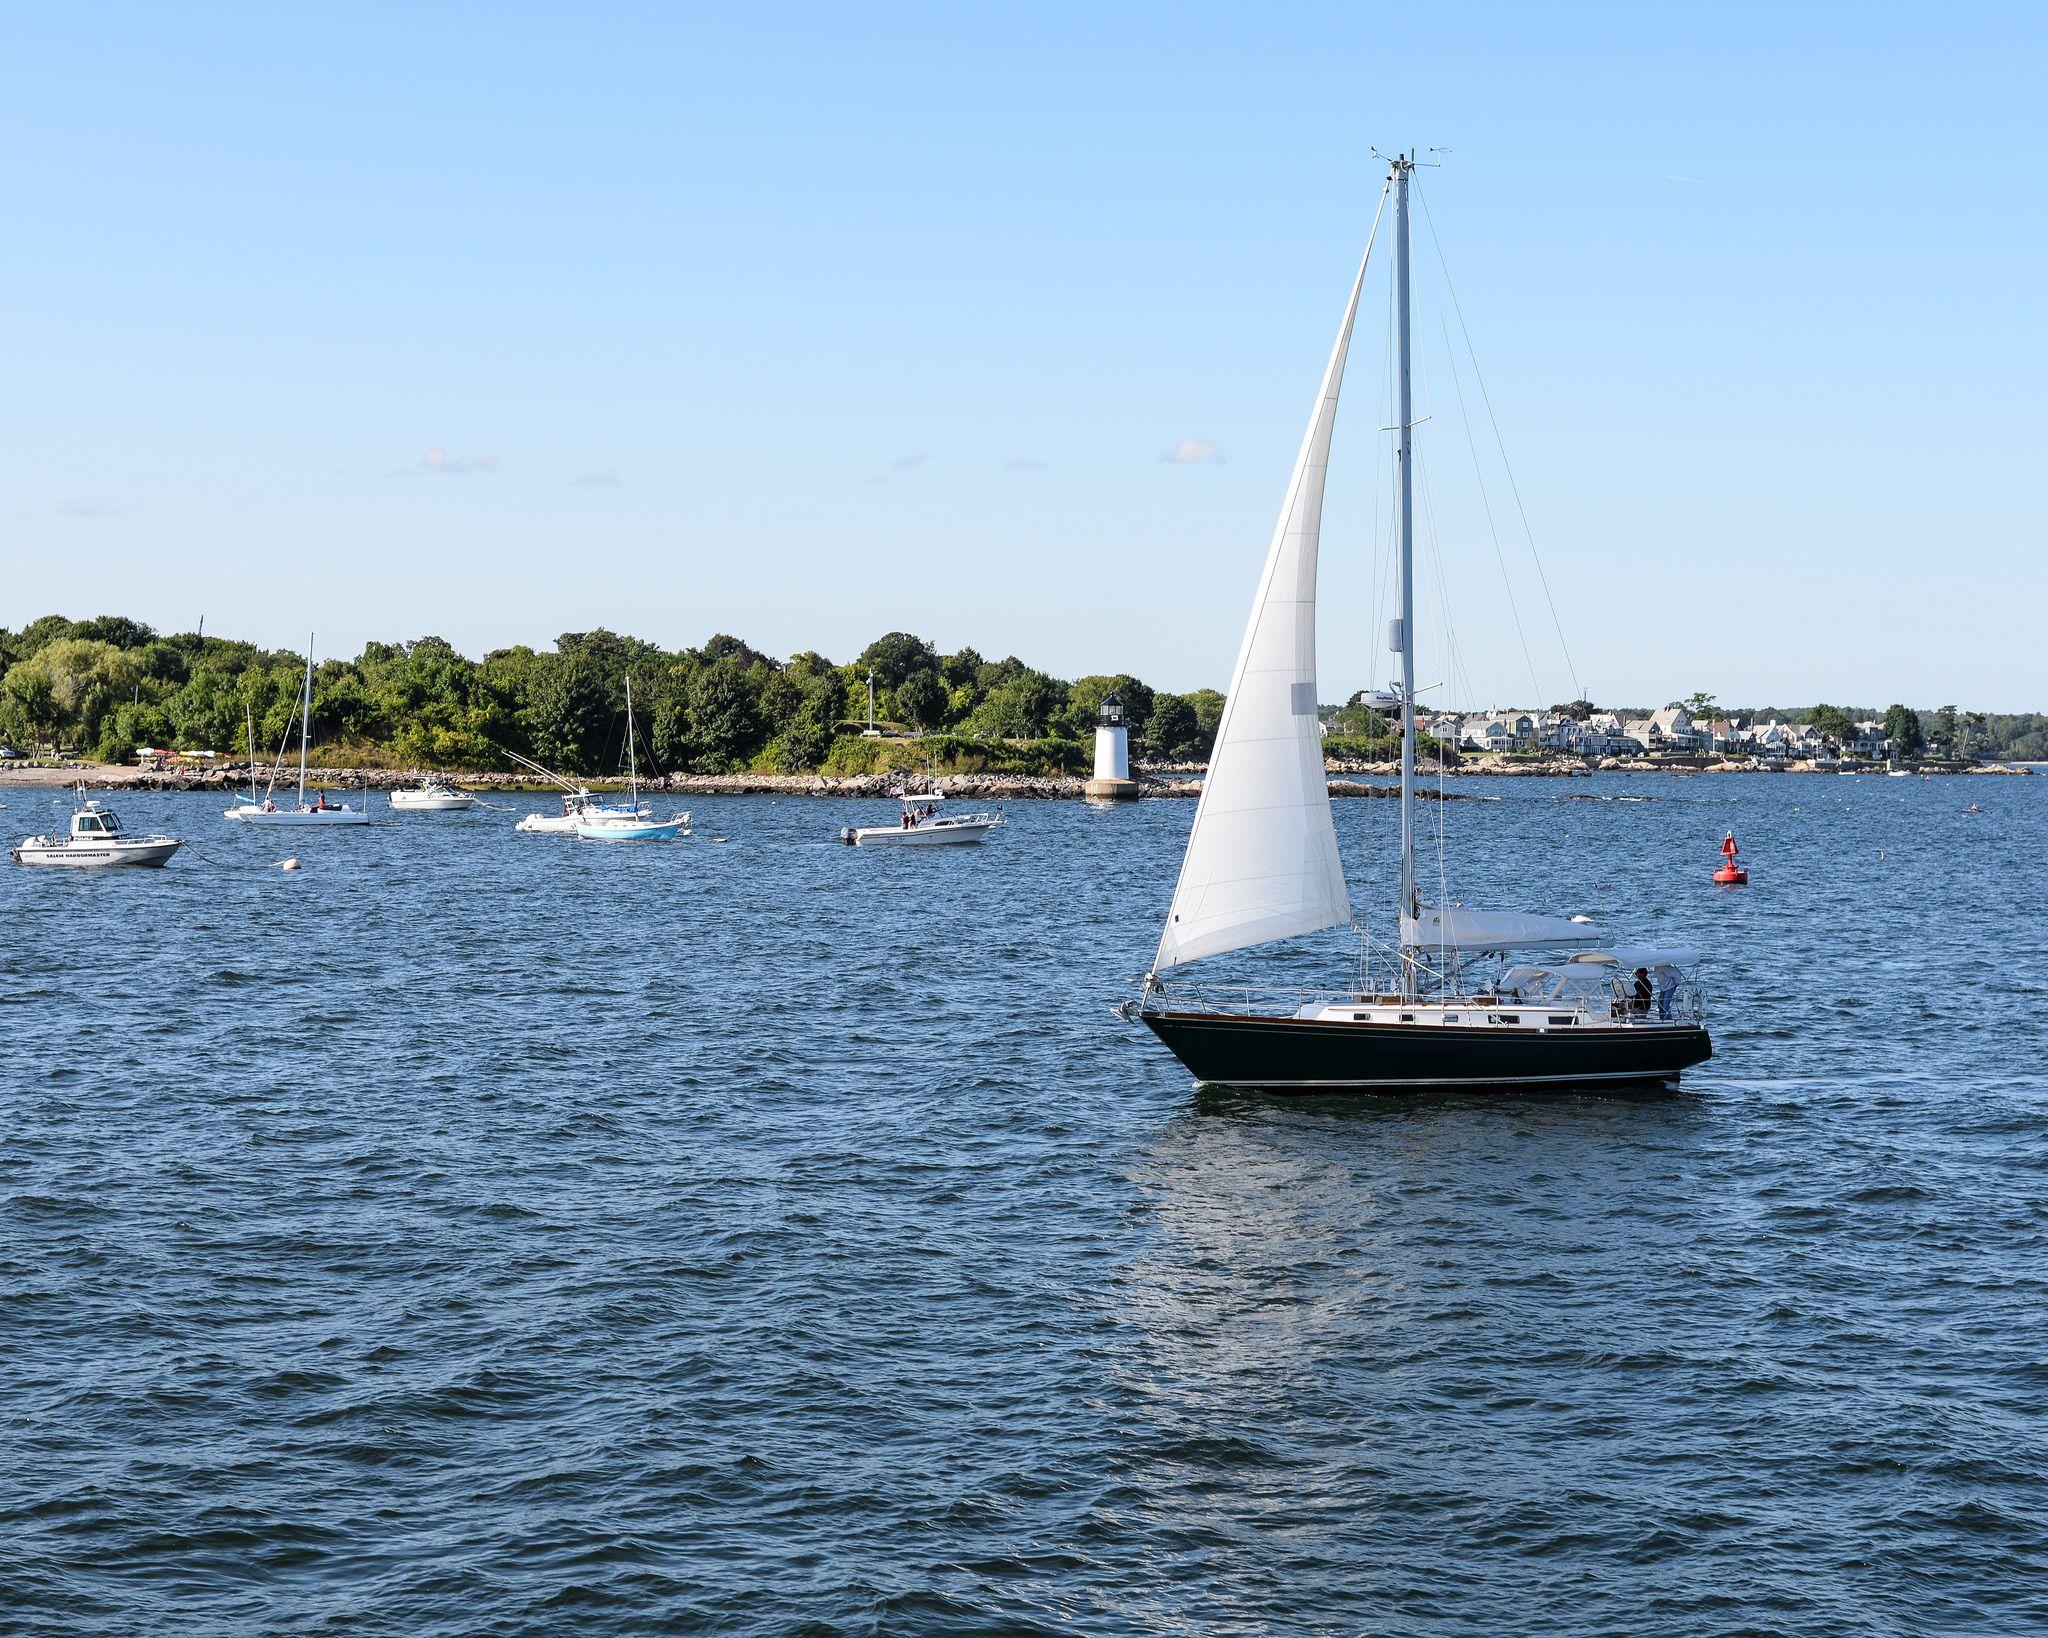 White sloop sailboat entering harbor